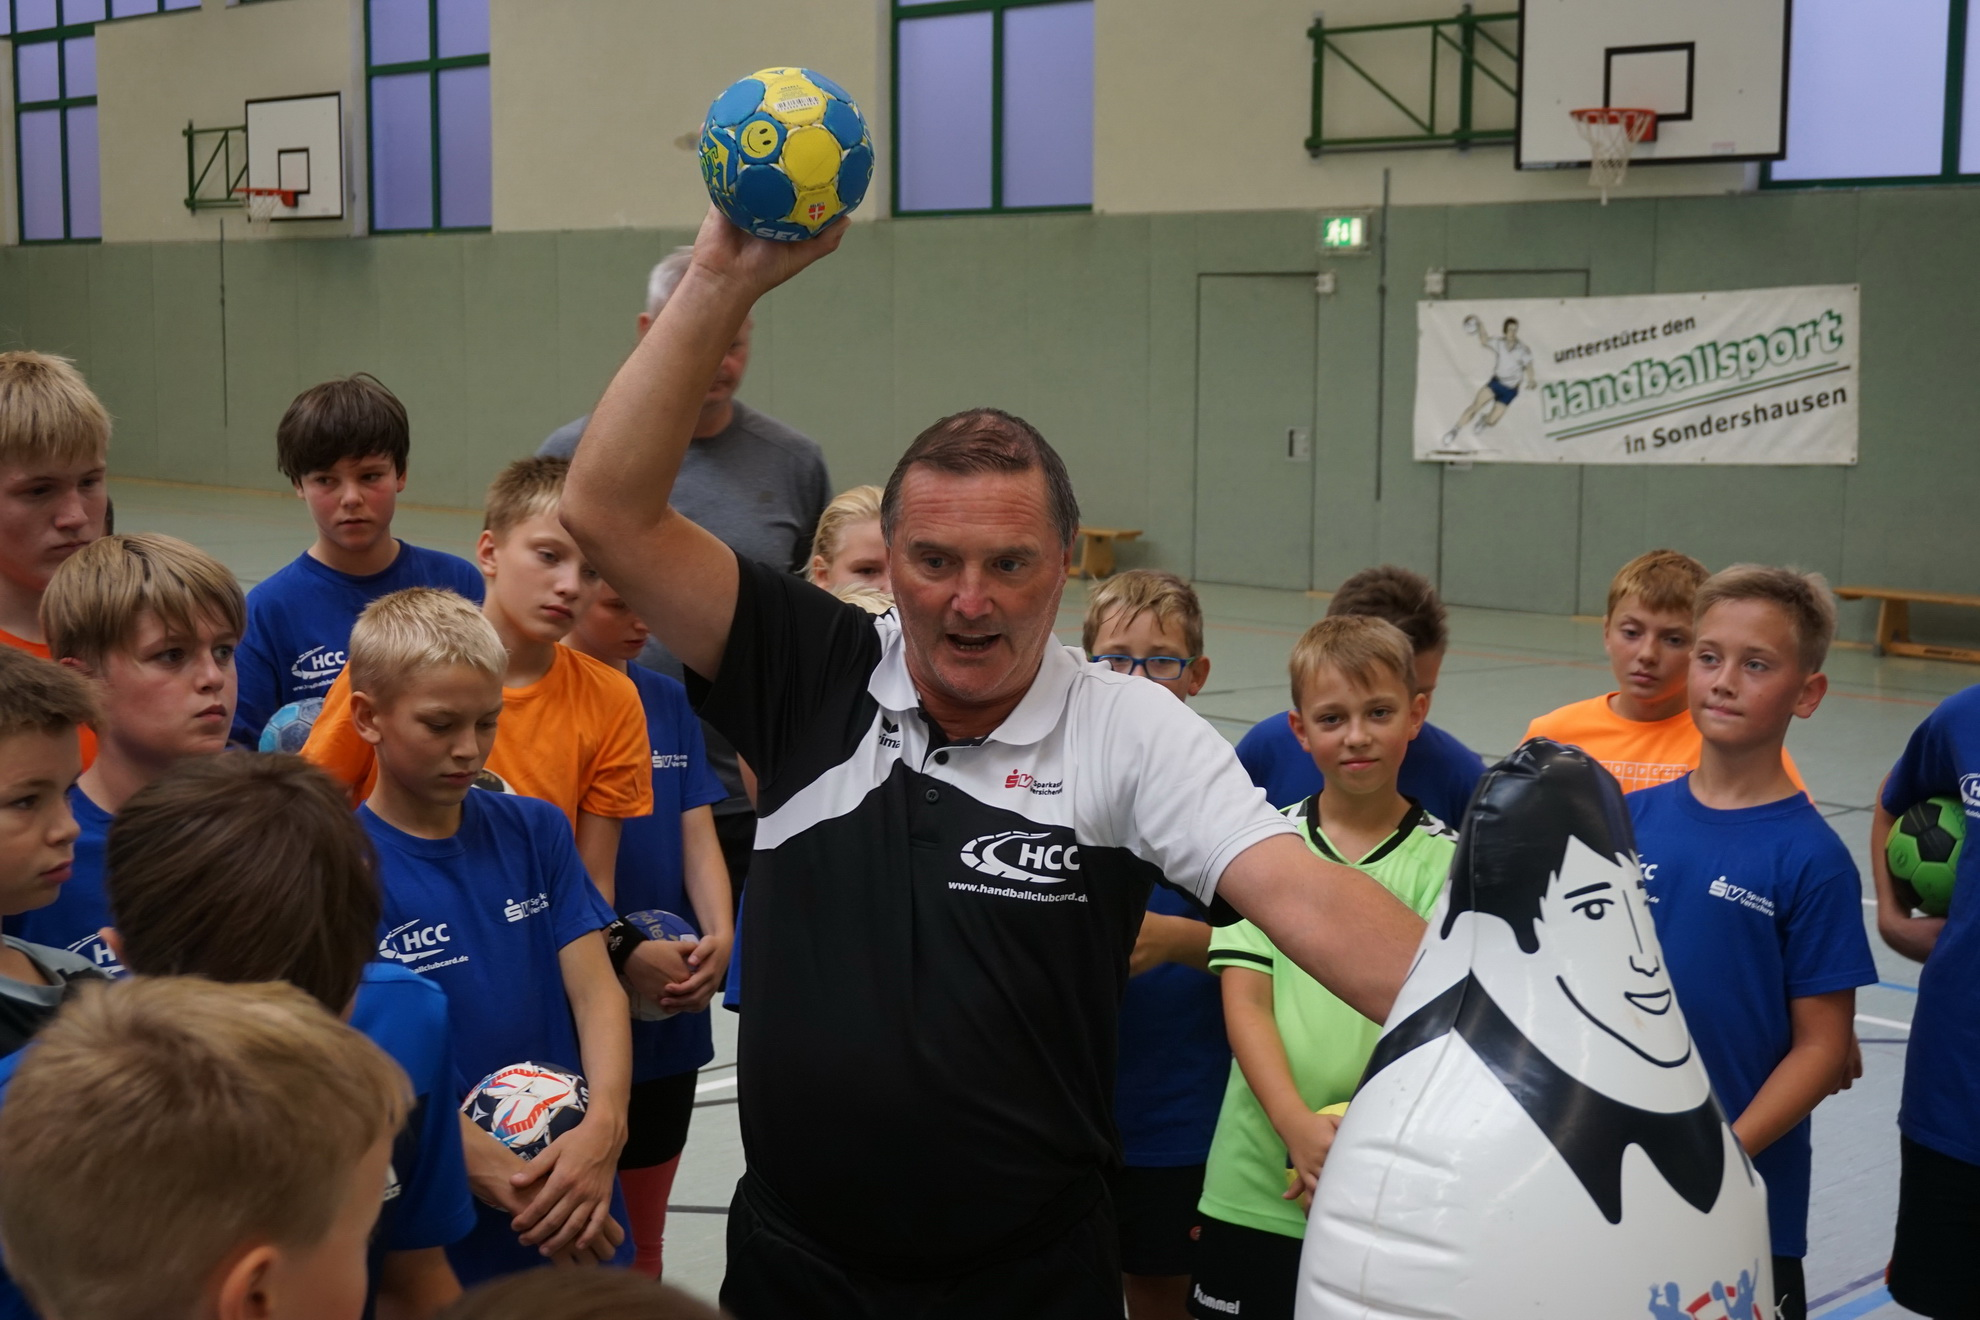 201808_Handballcamp_SDH_MG_199w